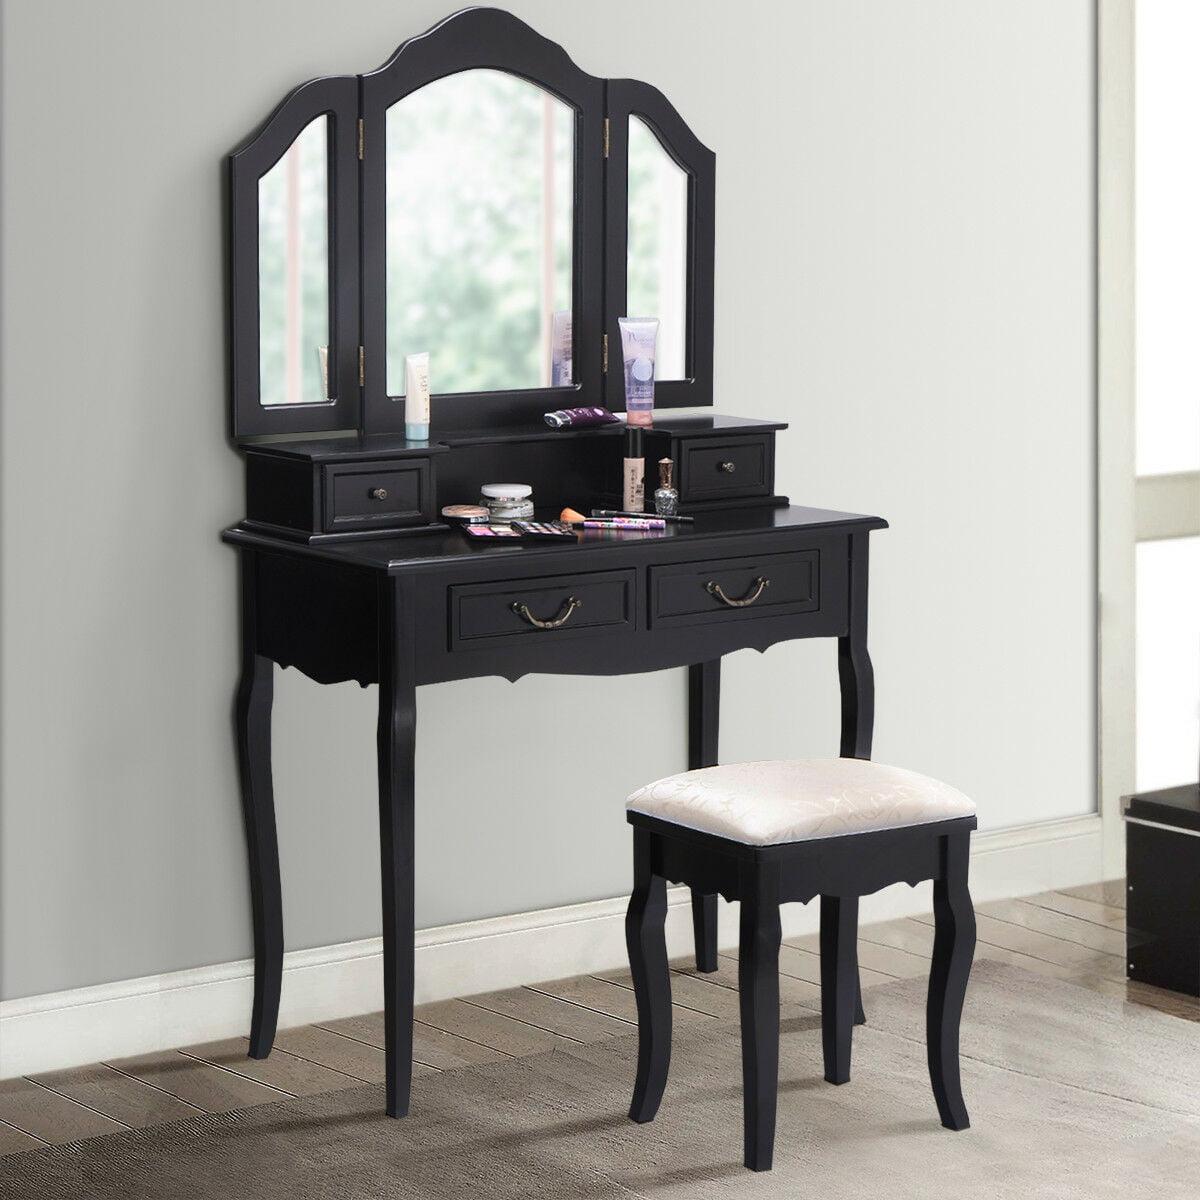 Gymax Vanity Set Makeup Table Dresser Tri Folding Mirror 4 Drawers with Stool Black